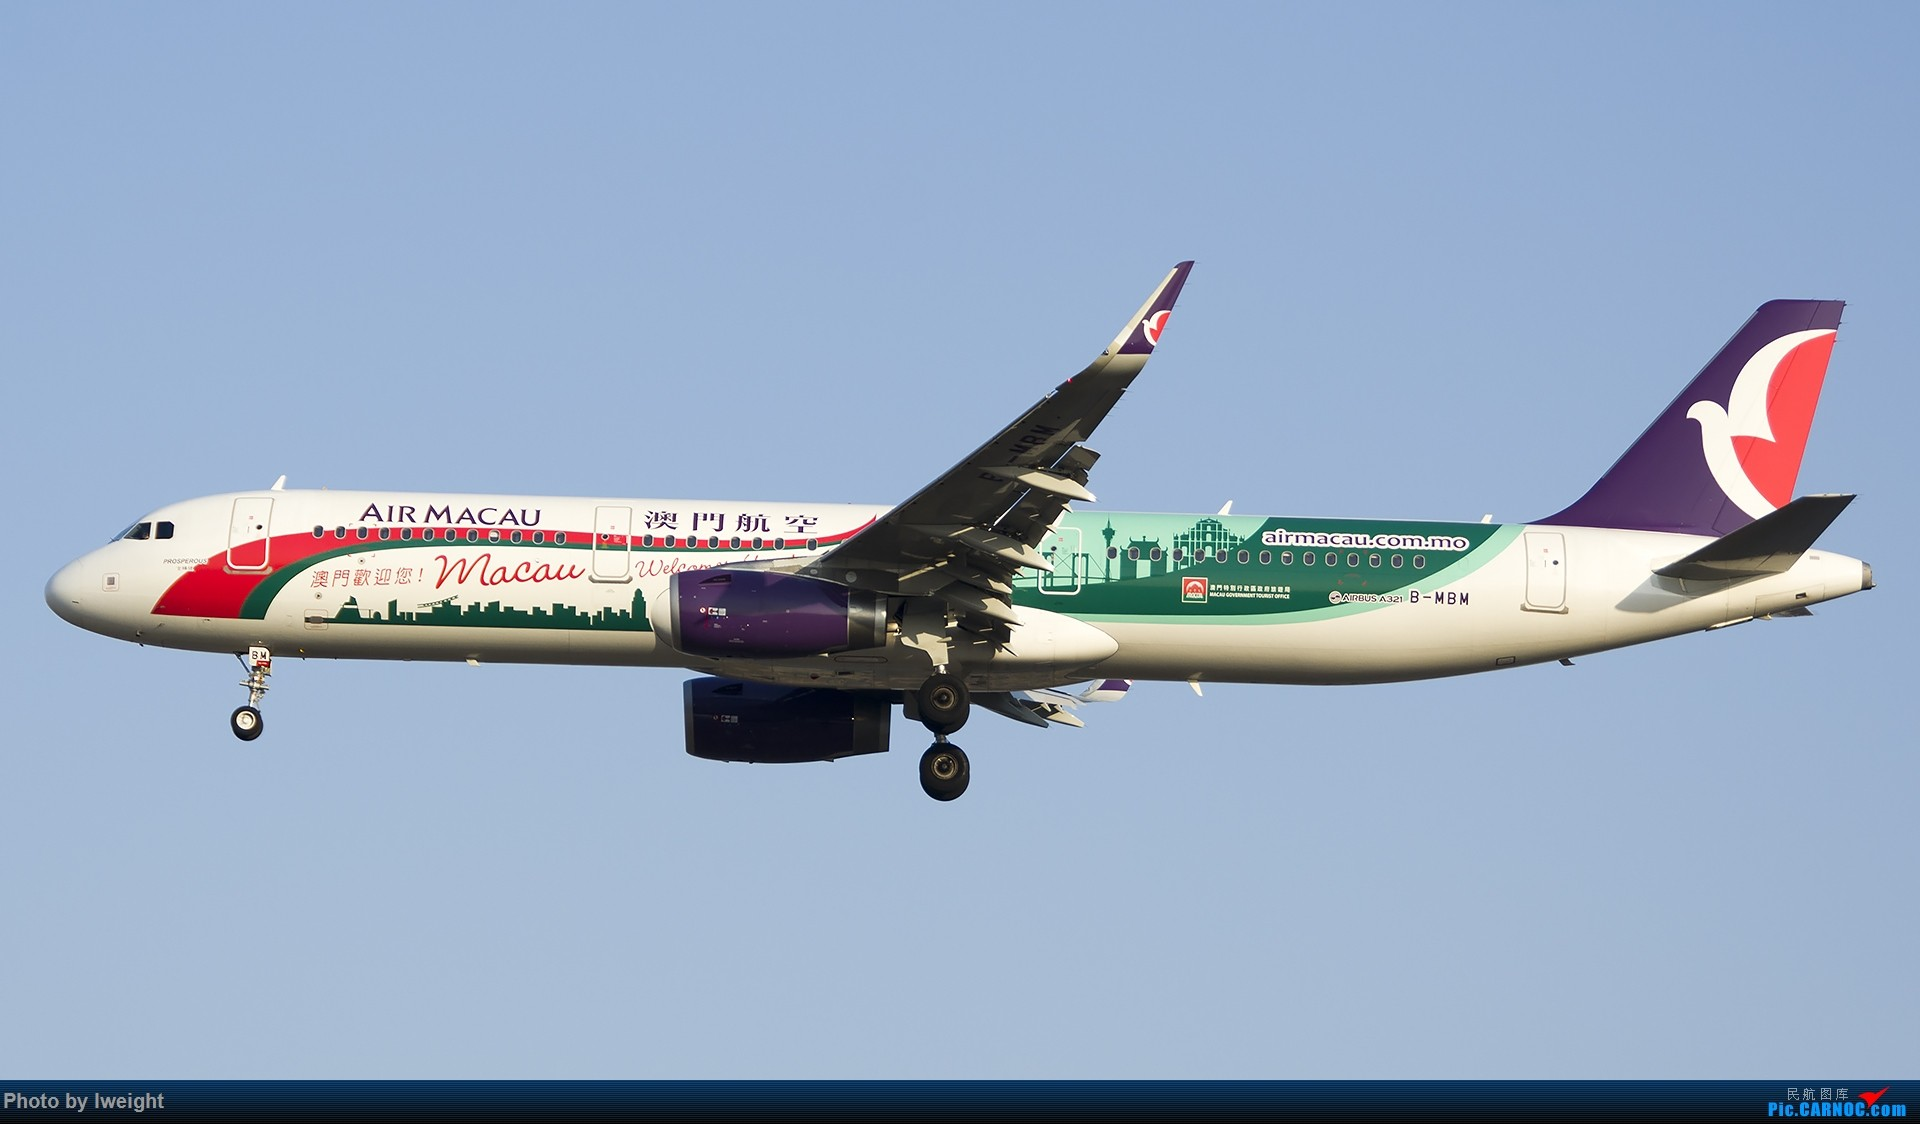 Re:[原创]庆祝升级777,发上今天在首都机场拍的所有飞机【2014-12-14】 AIRBUS A321-200 B-MBM 中国北京首都国际机场